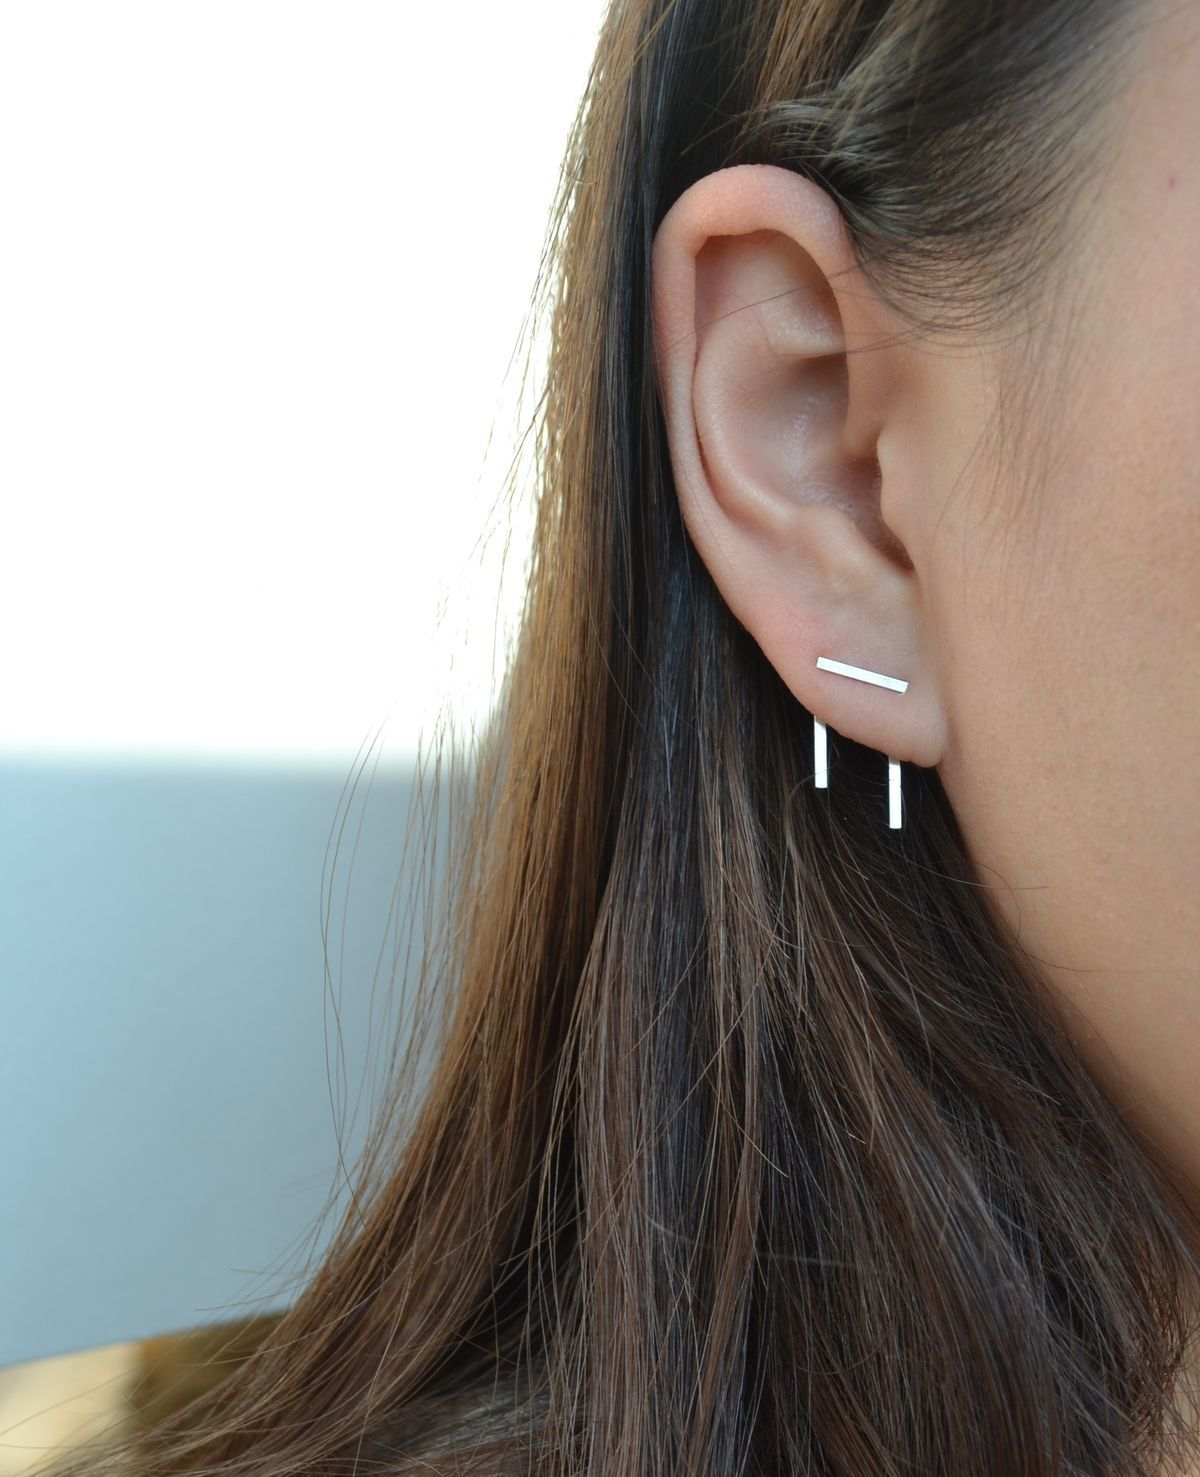 Bump under nose piercing  Pin by  Jéssié uaua on jewellry  Pinterest  Piercing Ear